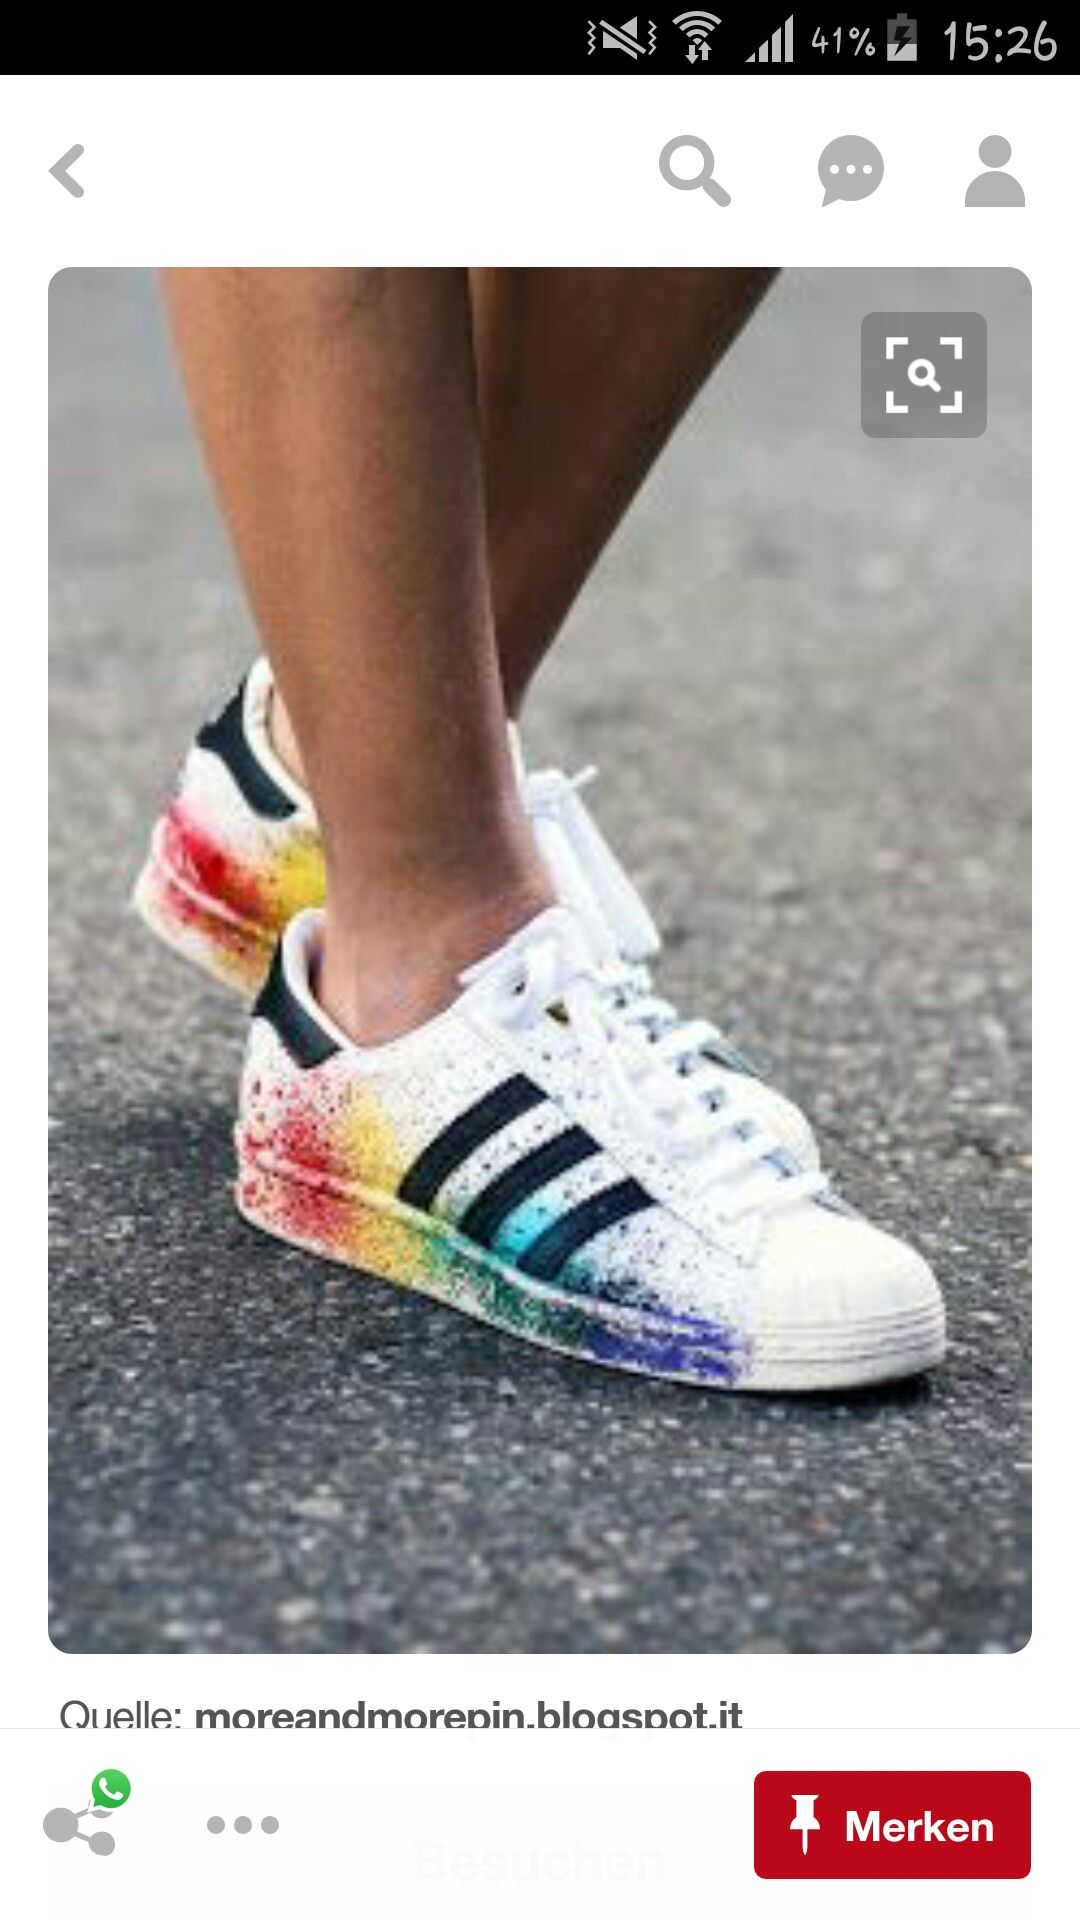 Adidas Tumblr Tumblr Tumblr Schuhe Schuhe Adidas Schuhe